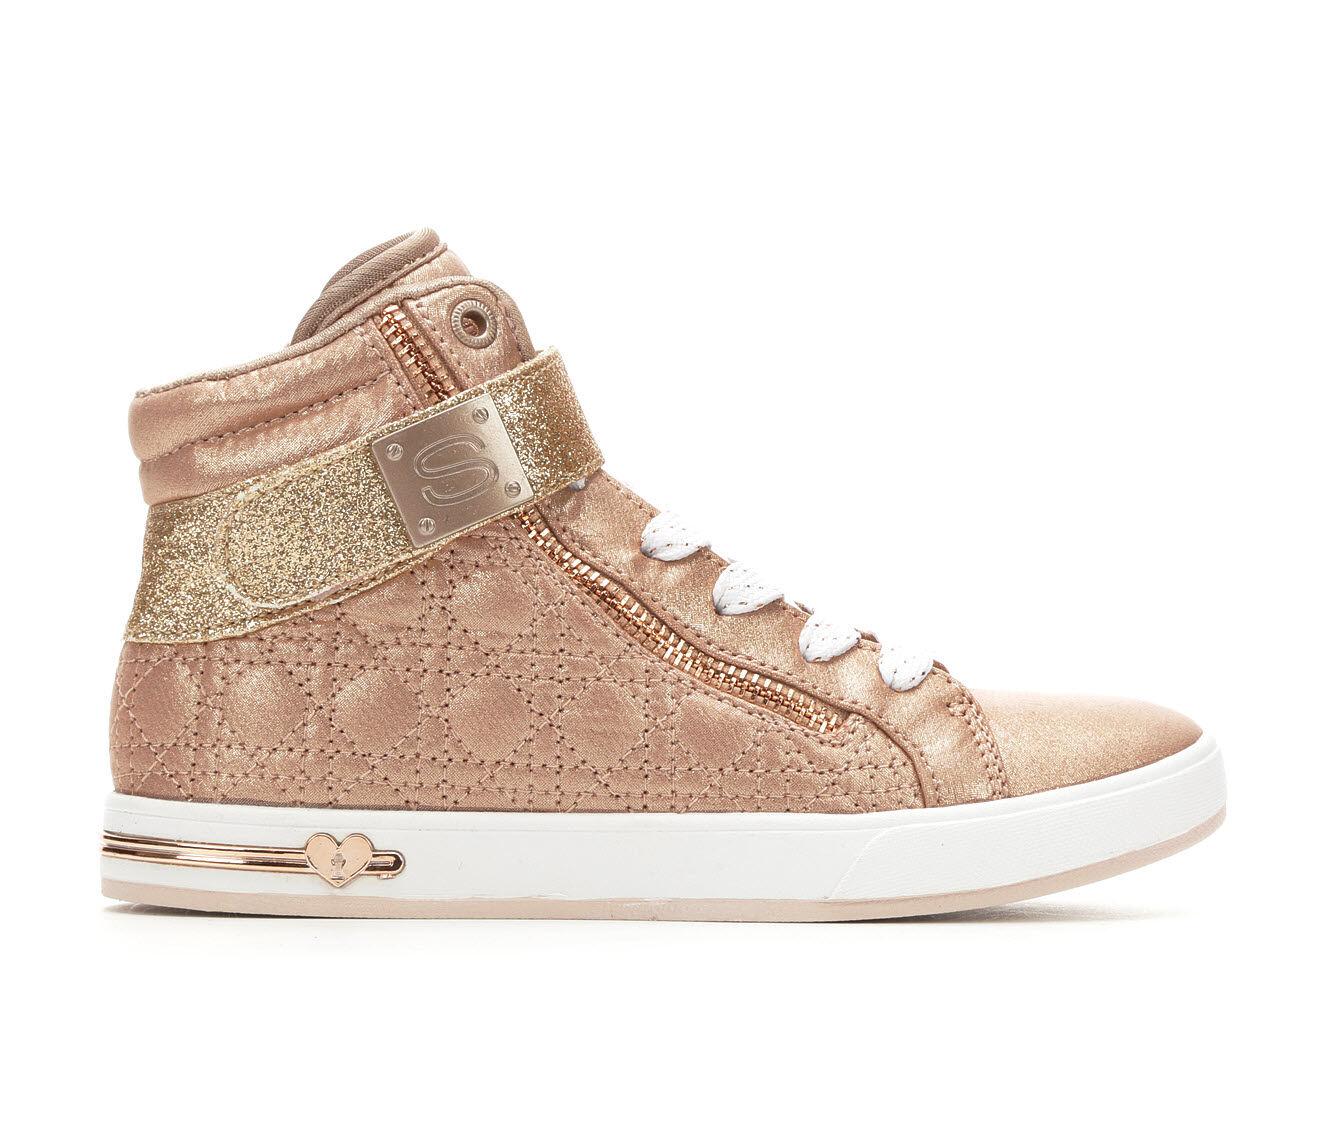 Girls' Skechers Little Kid & Big Kid Shoutouts High Top Sneakers